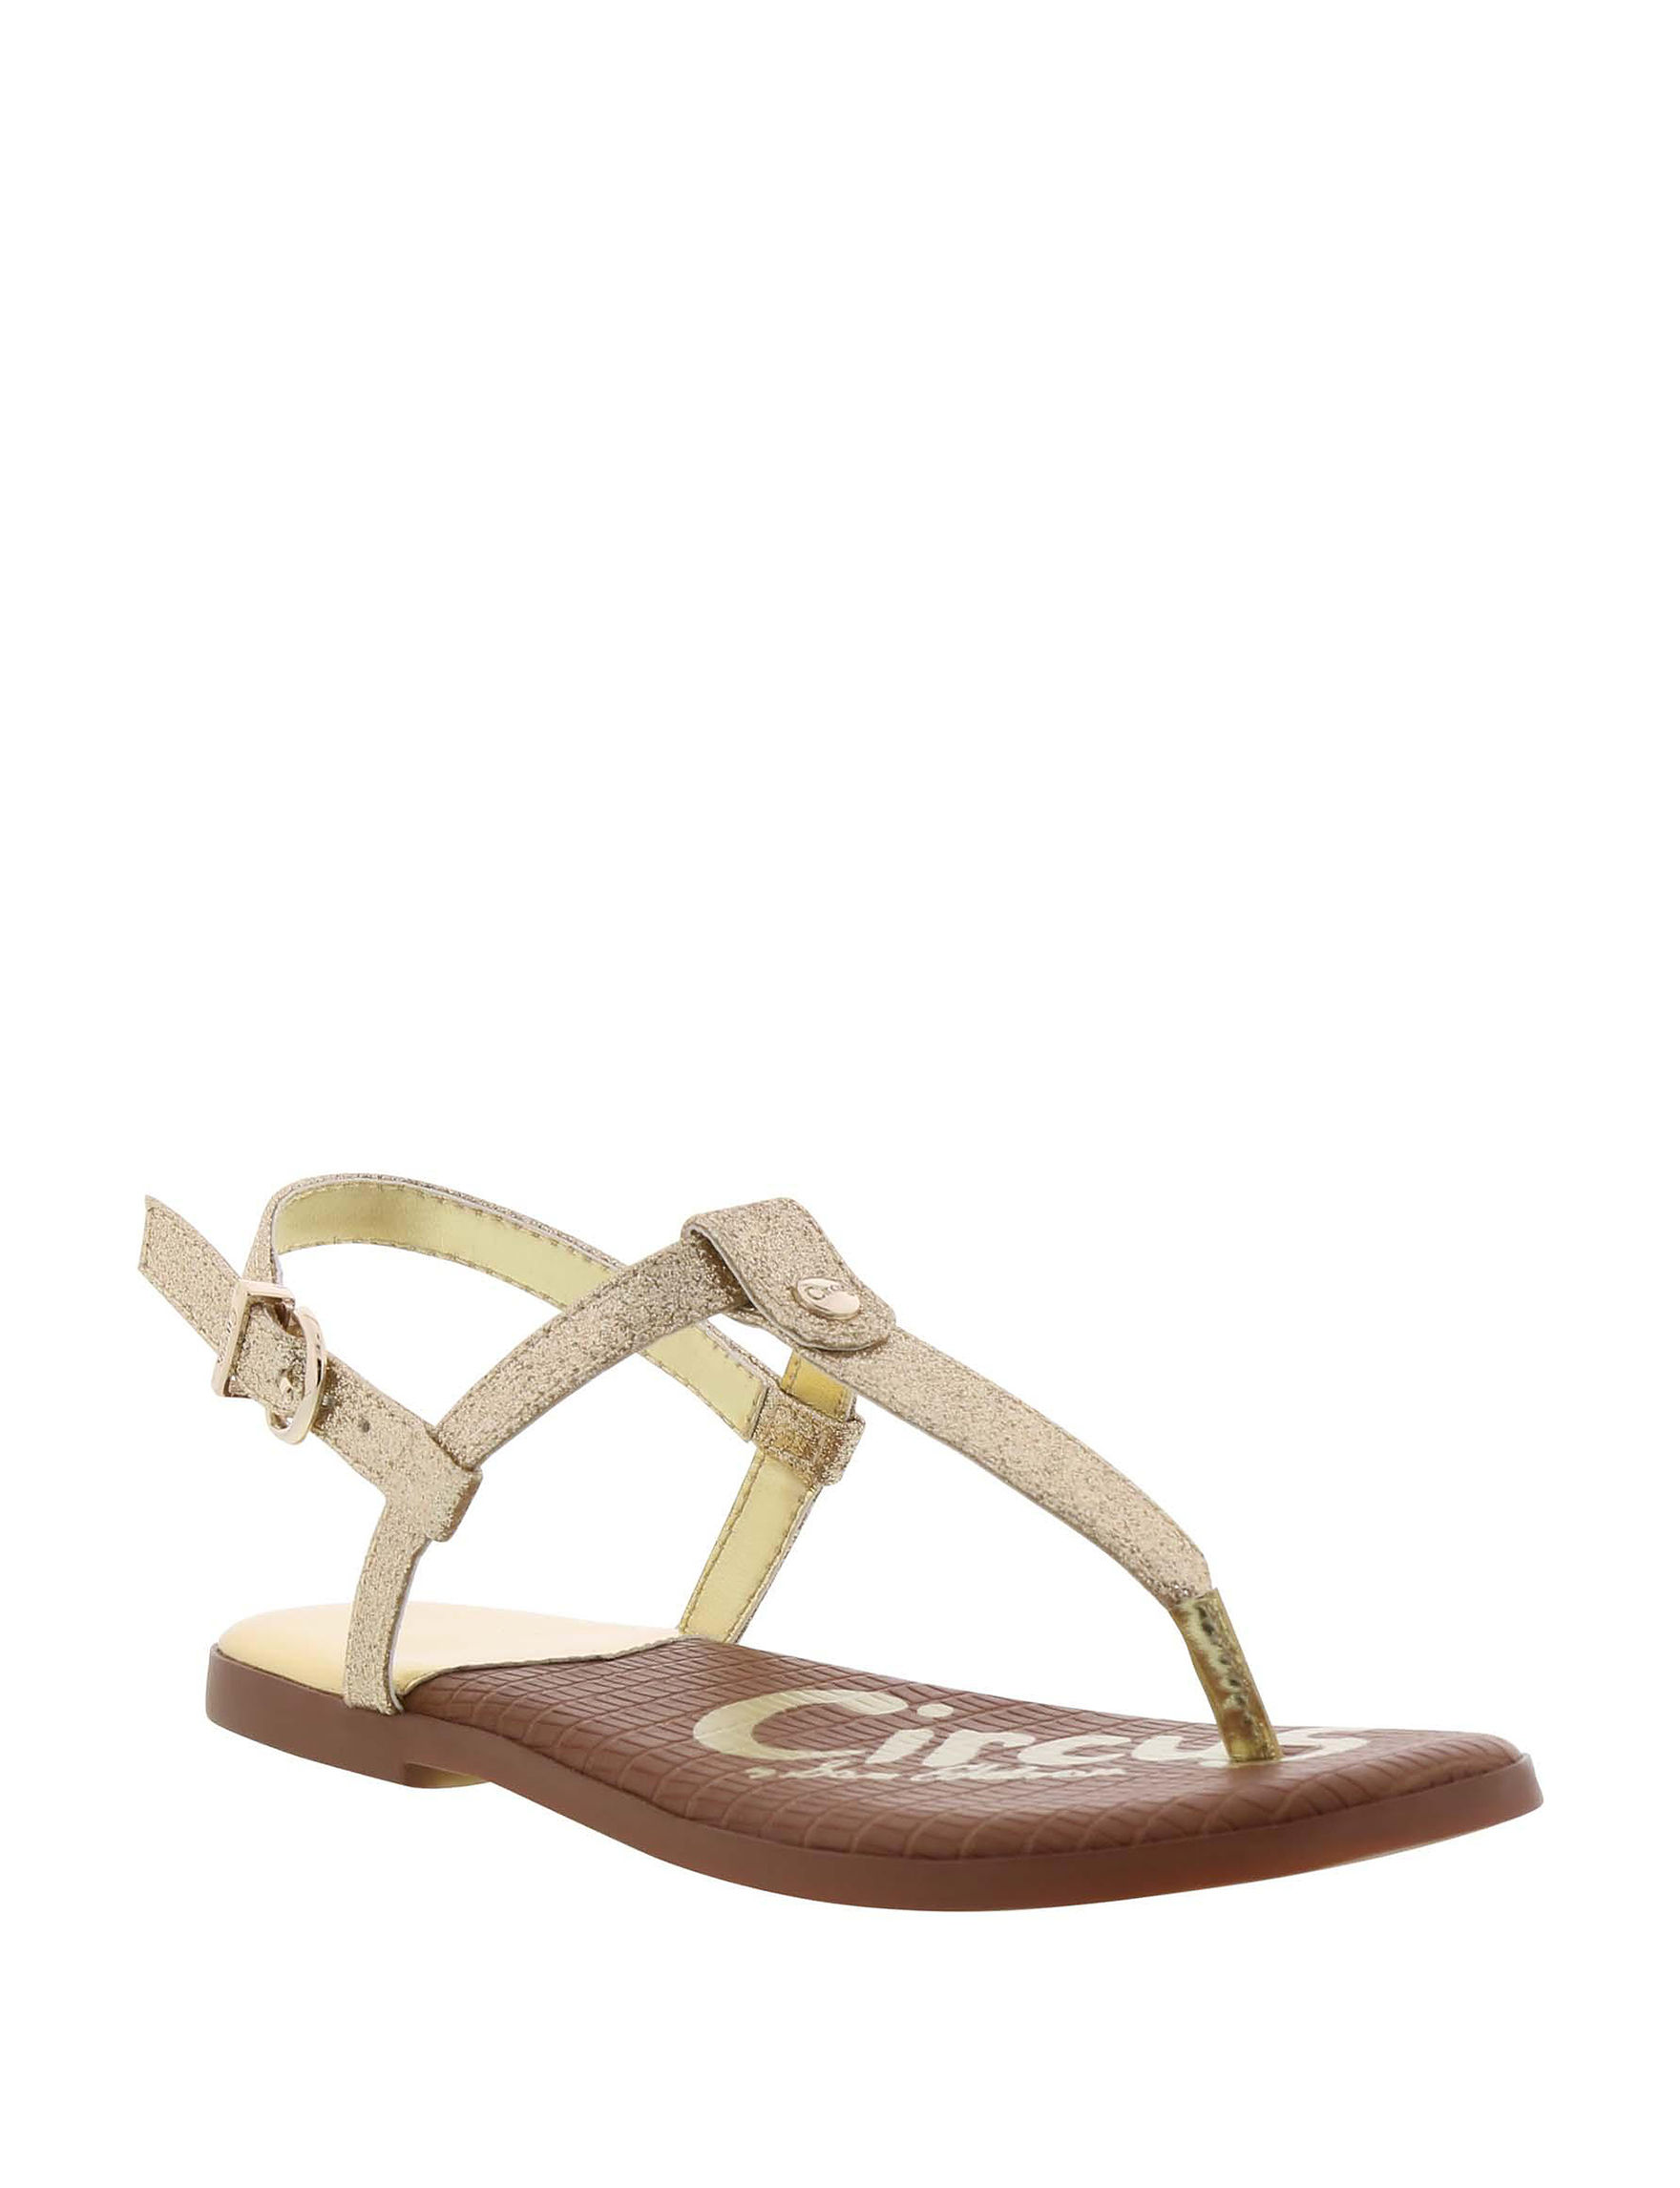 Circus By Sam Edelman Gold Flat Sandals